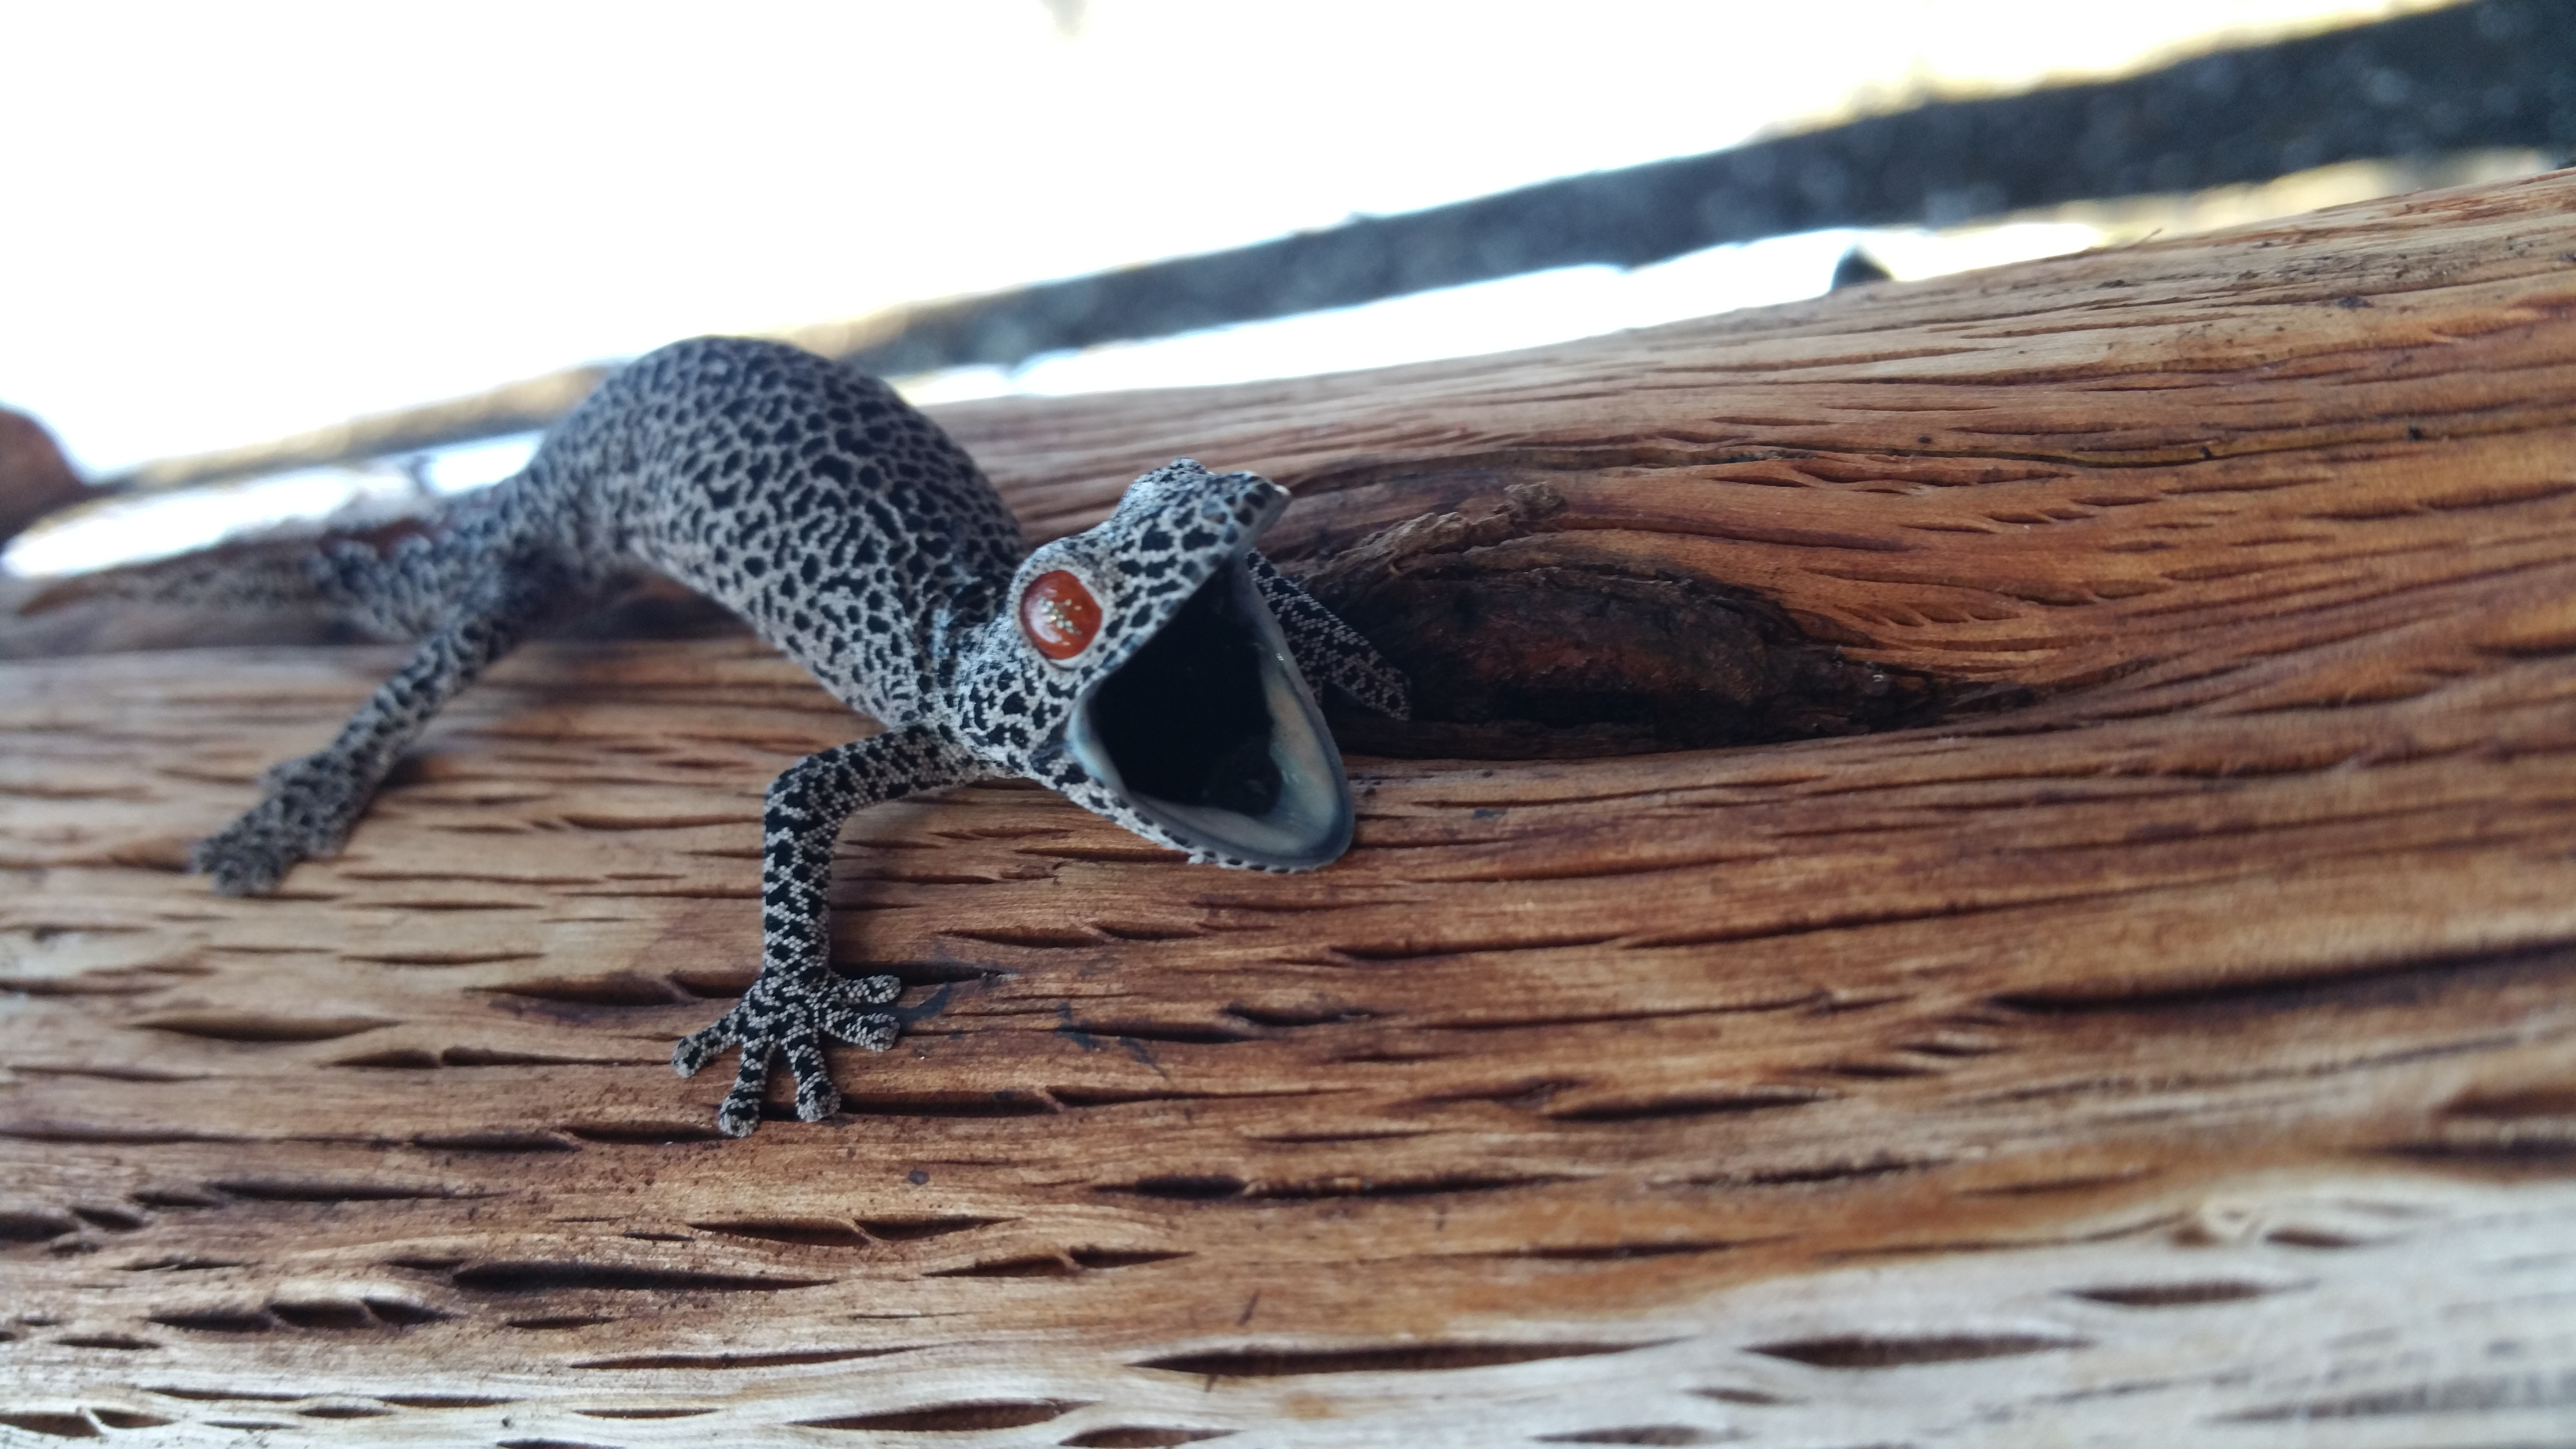 Fauna Spotter - EVNT